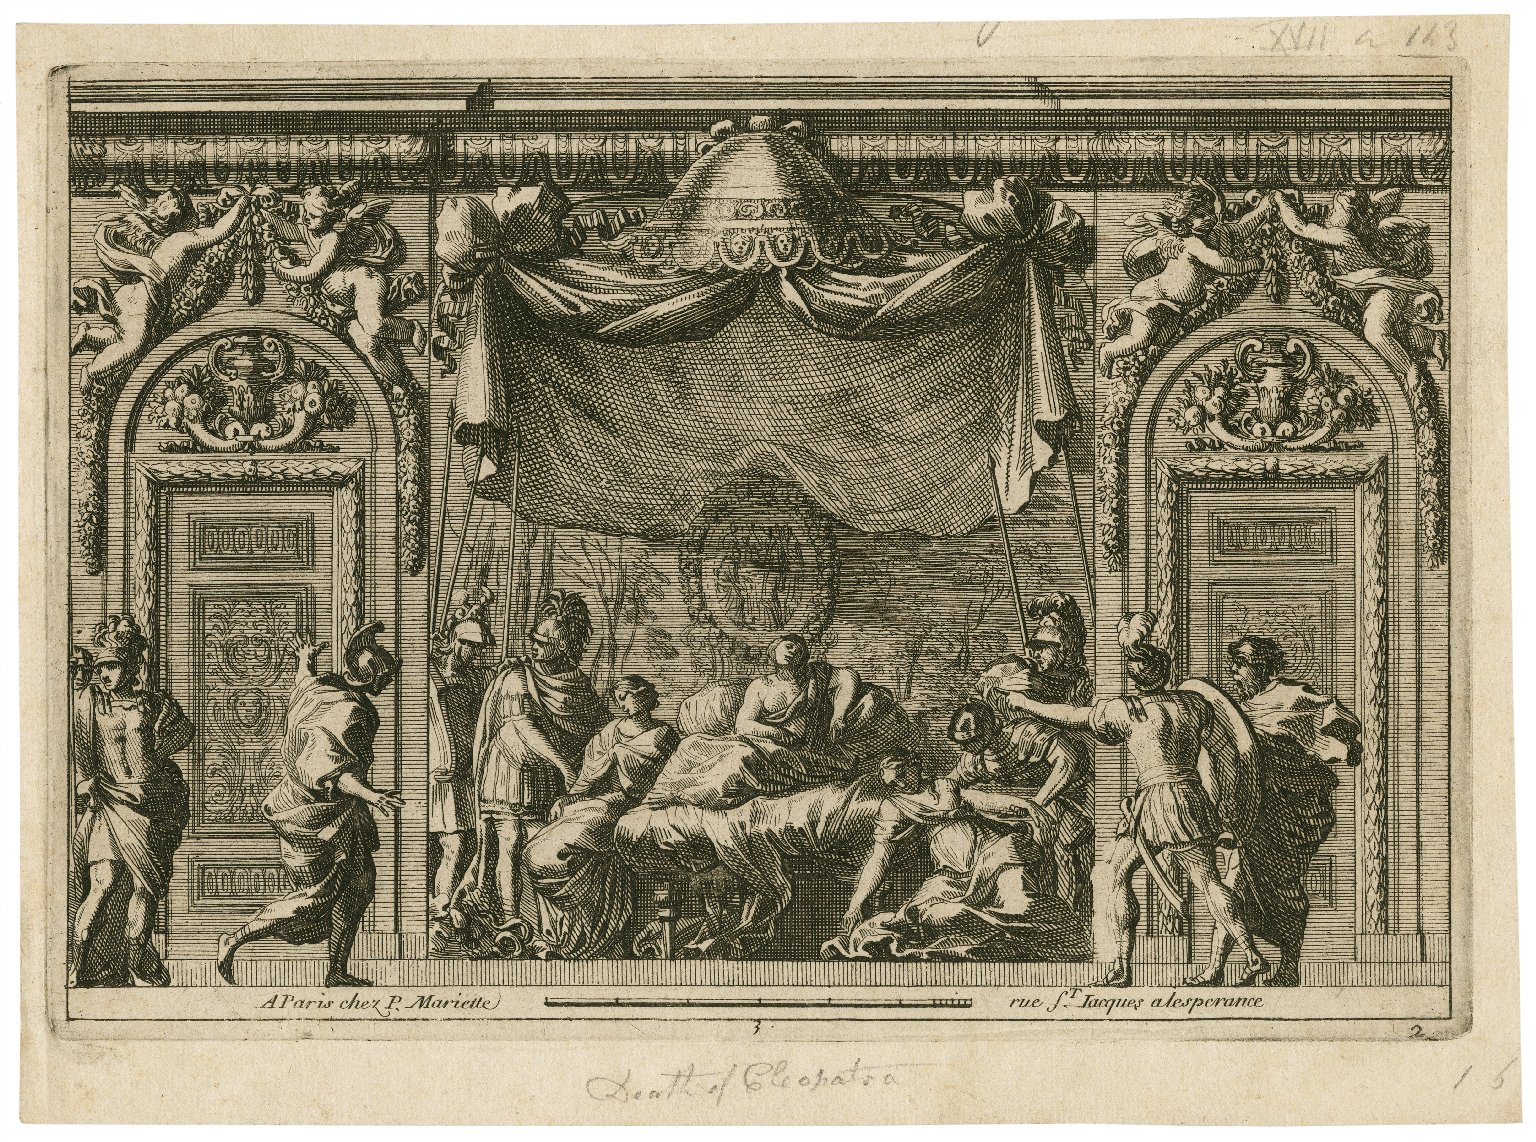 [Death of Cleopatra, Antony and Cleopatra, act 5, scene 2] [graphic].